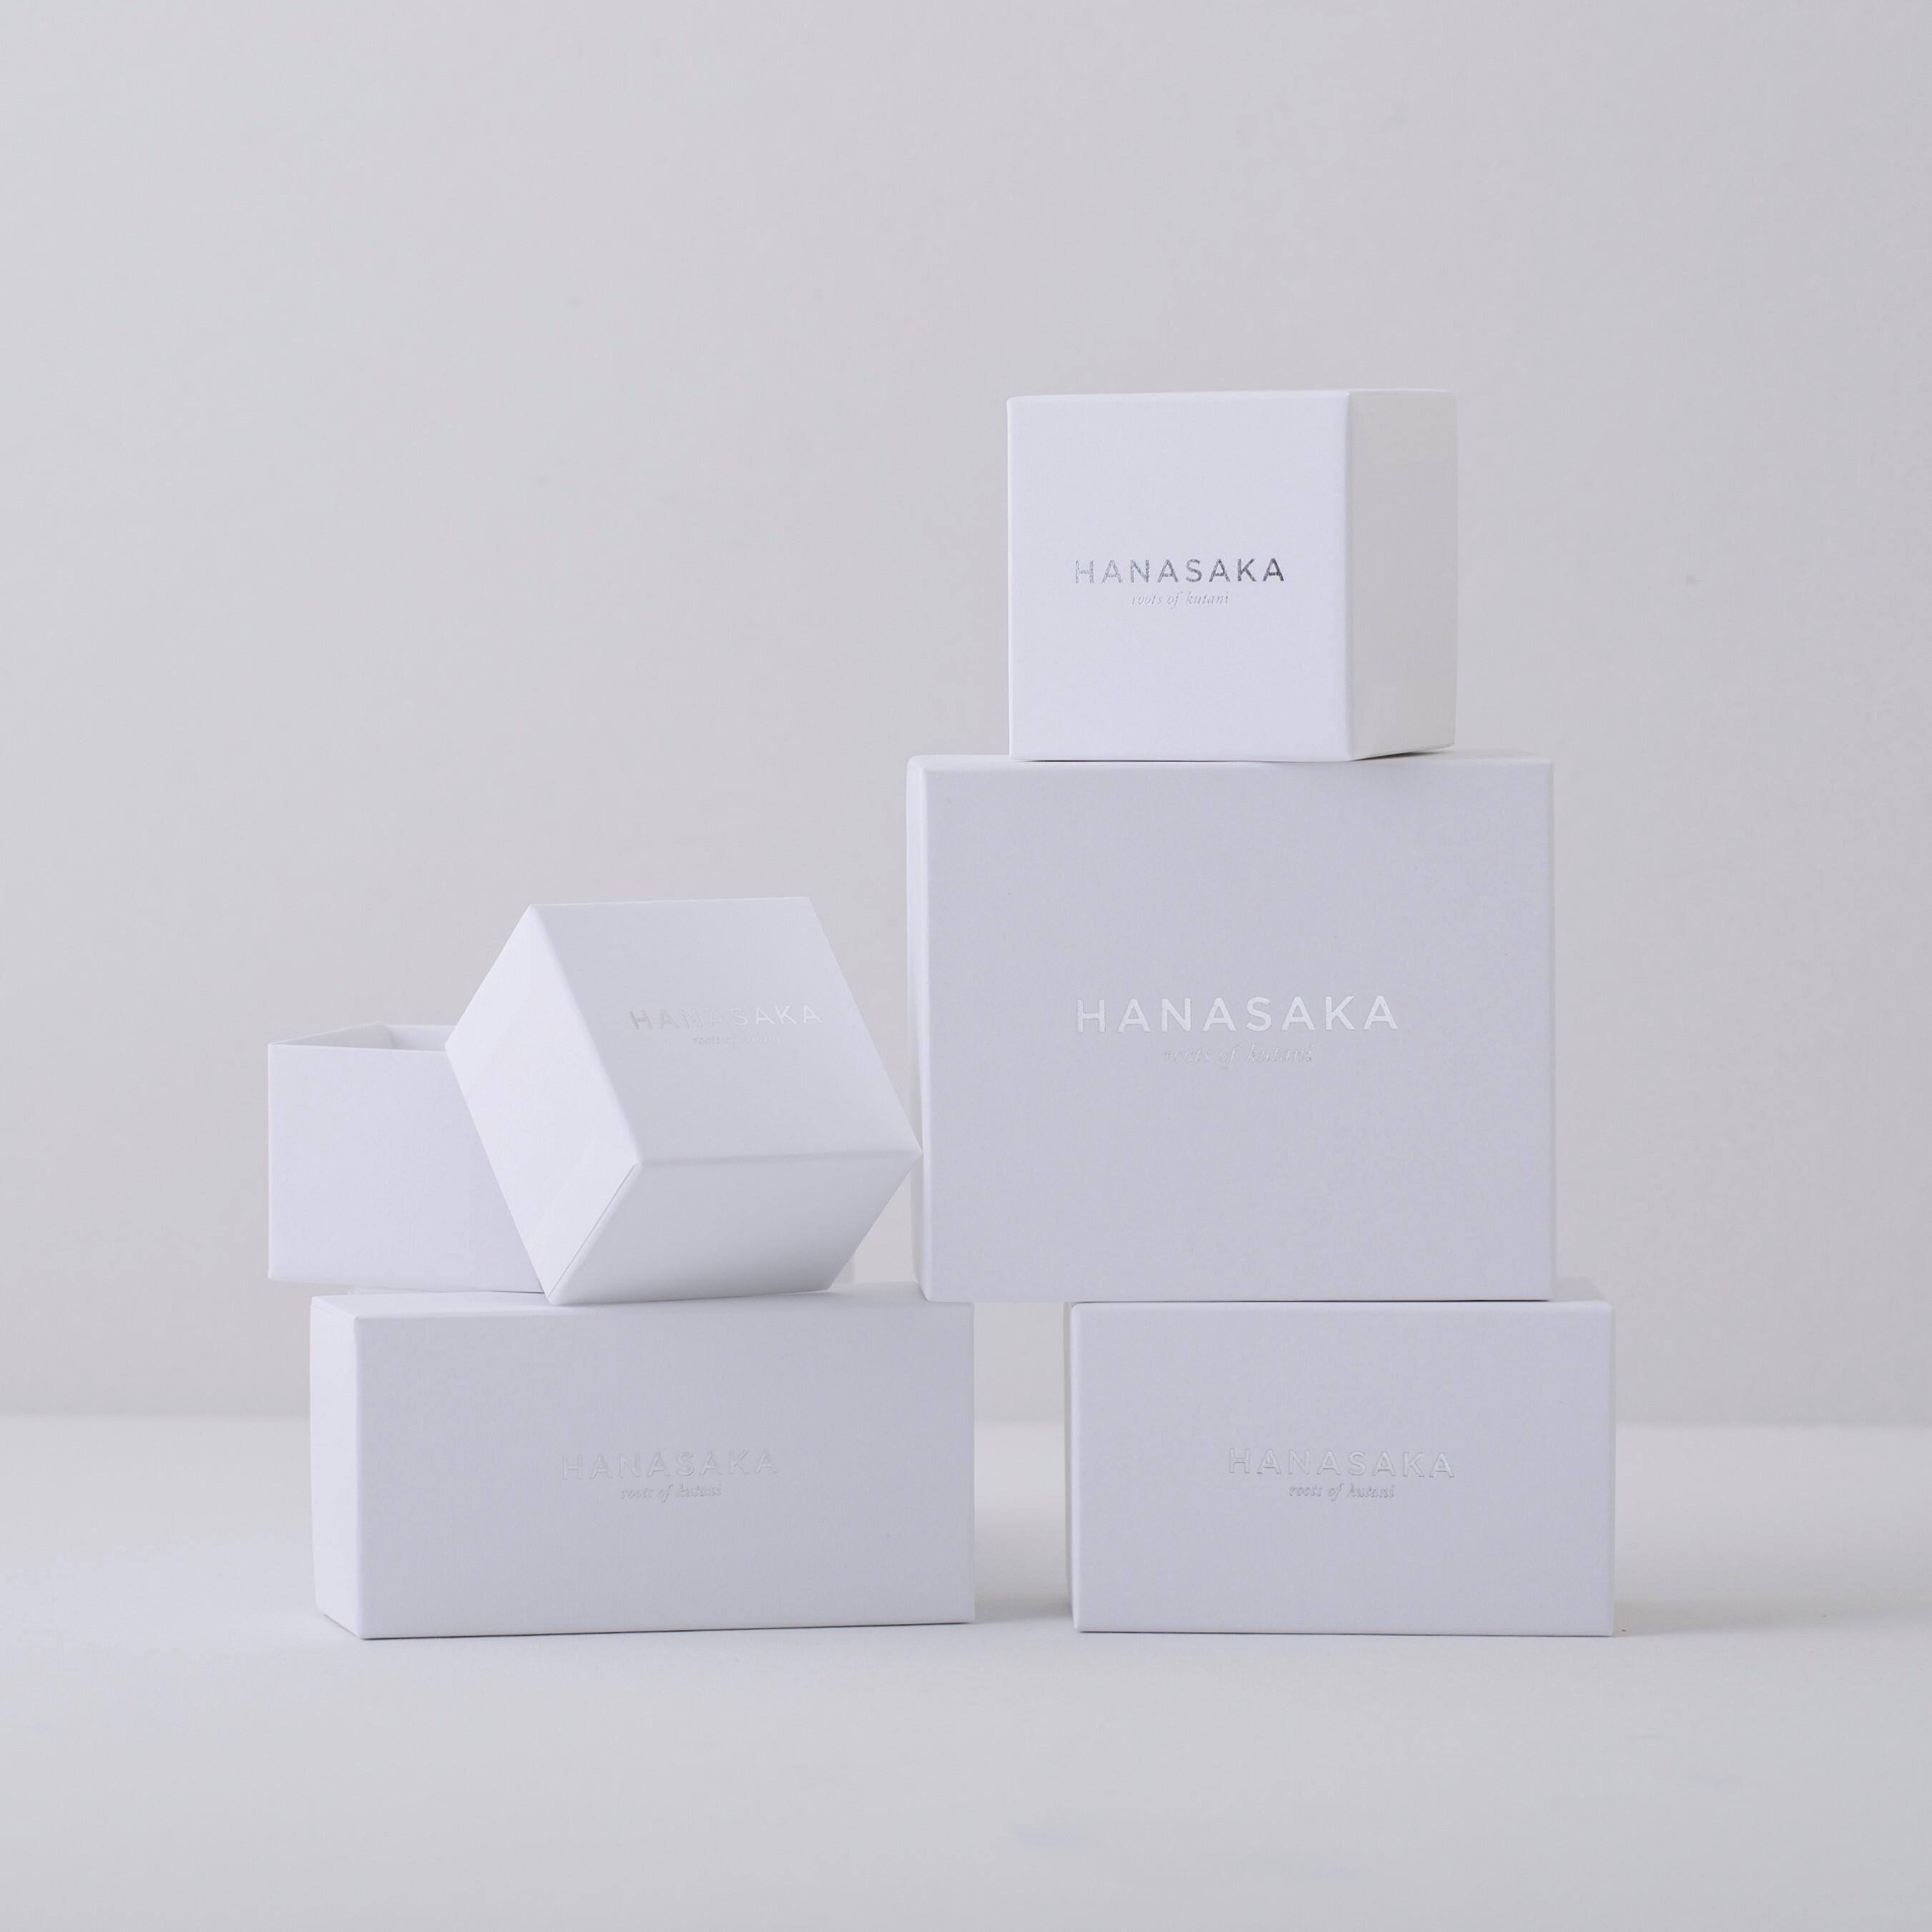 Blanc / choko / wa(plain)